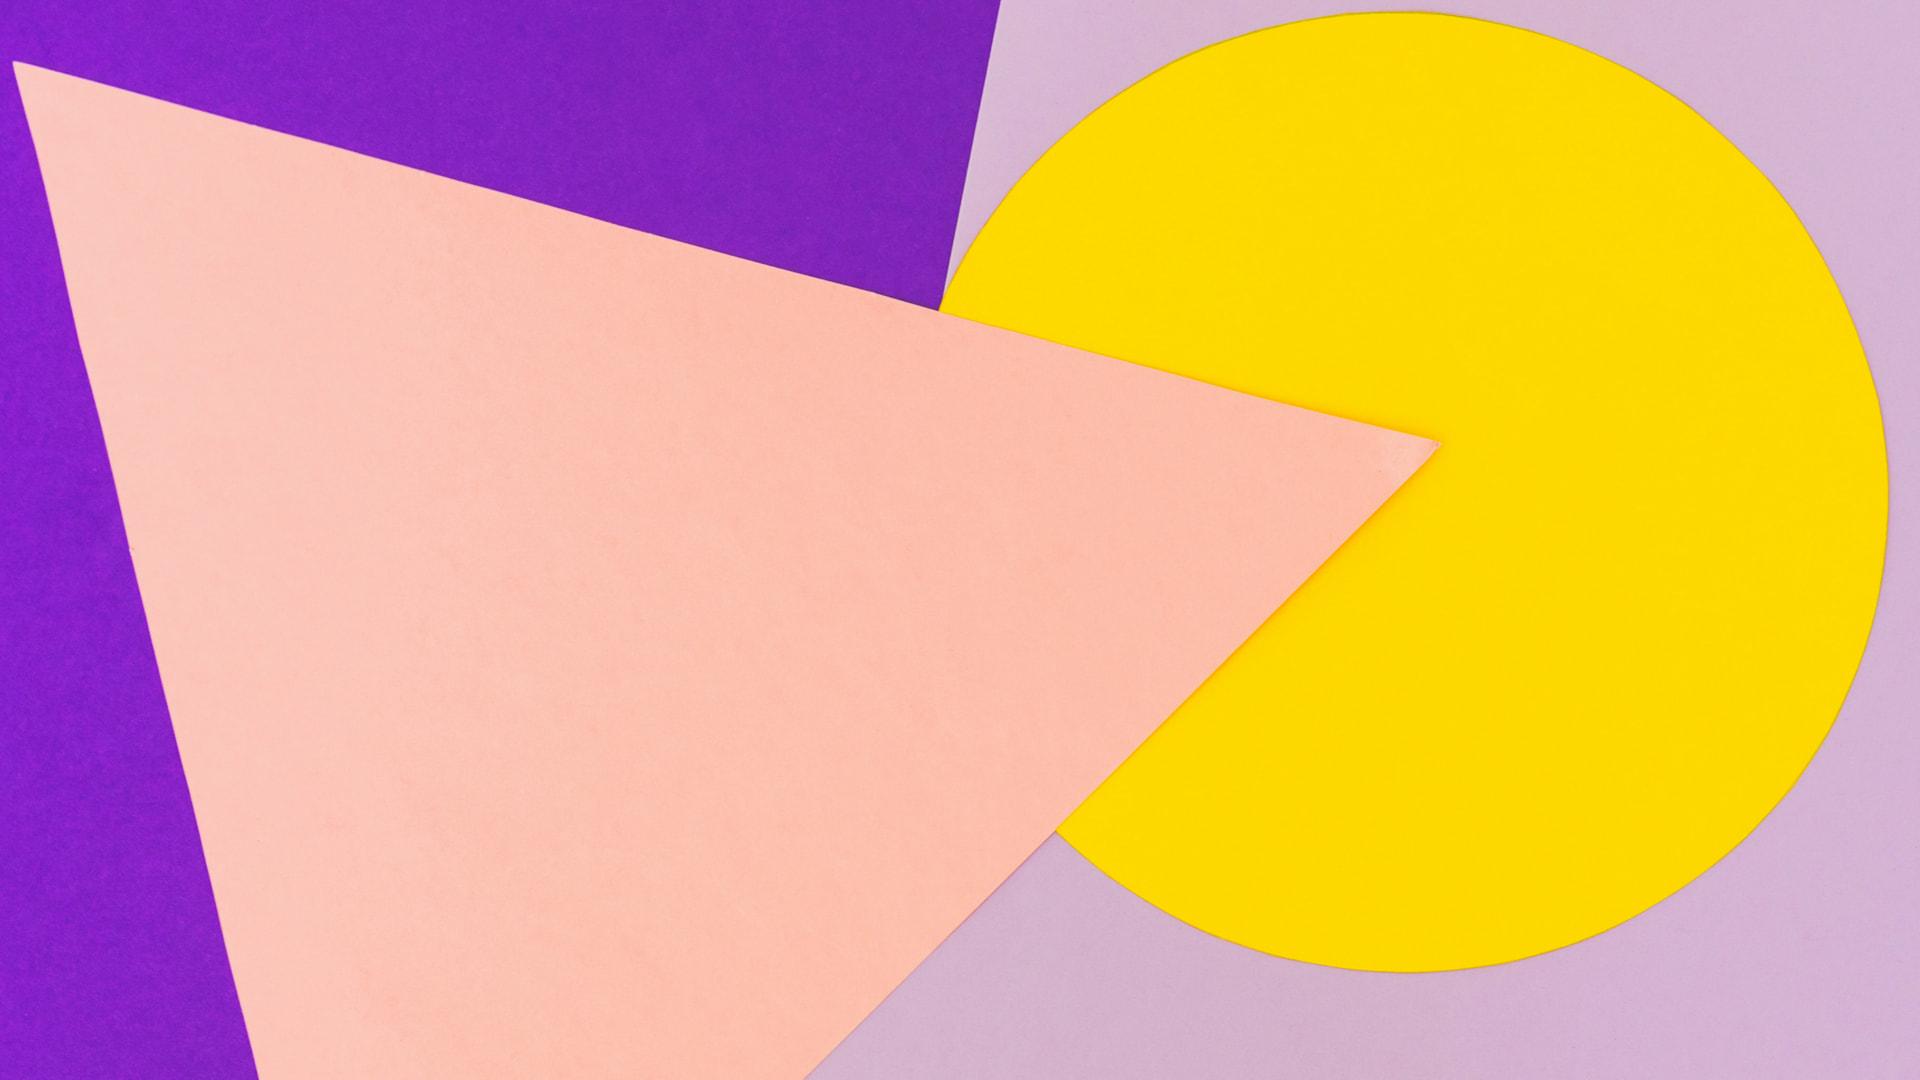 padroes geometricos